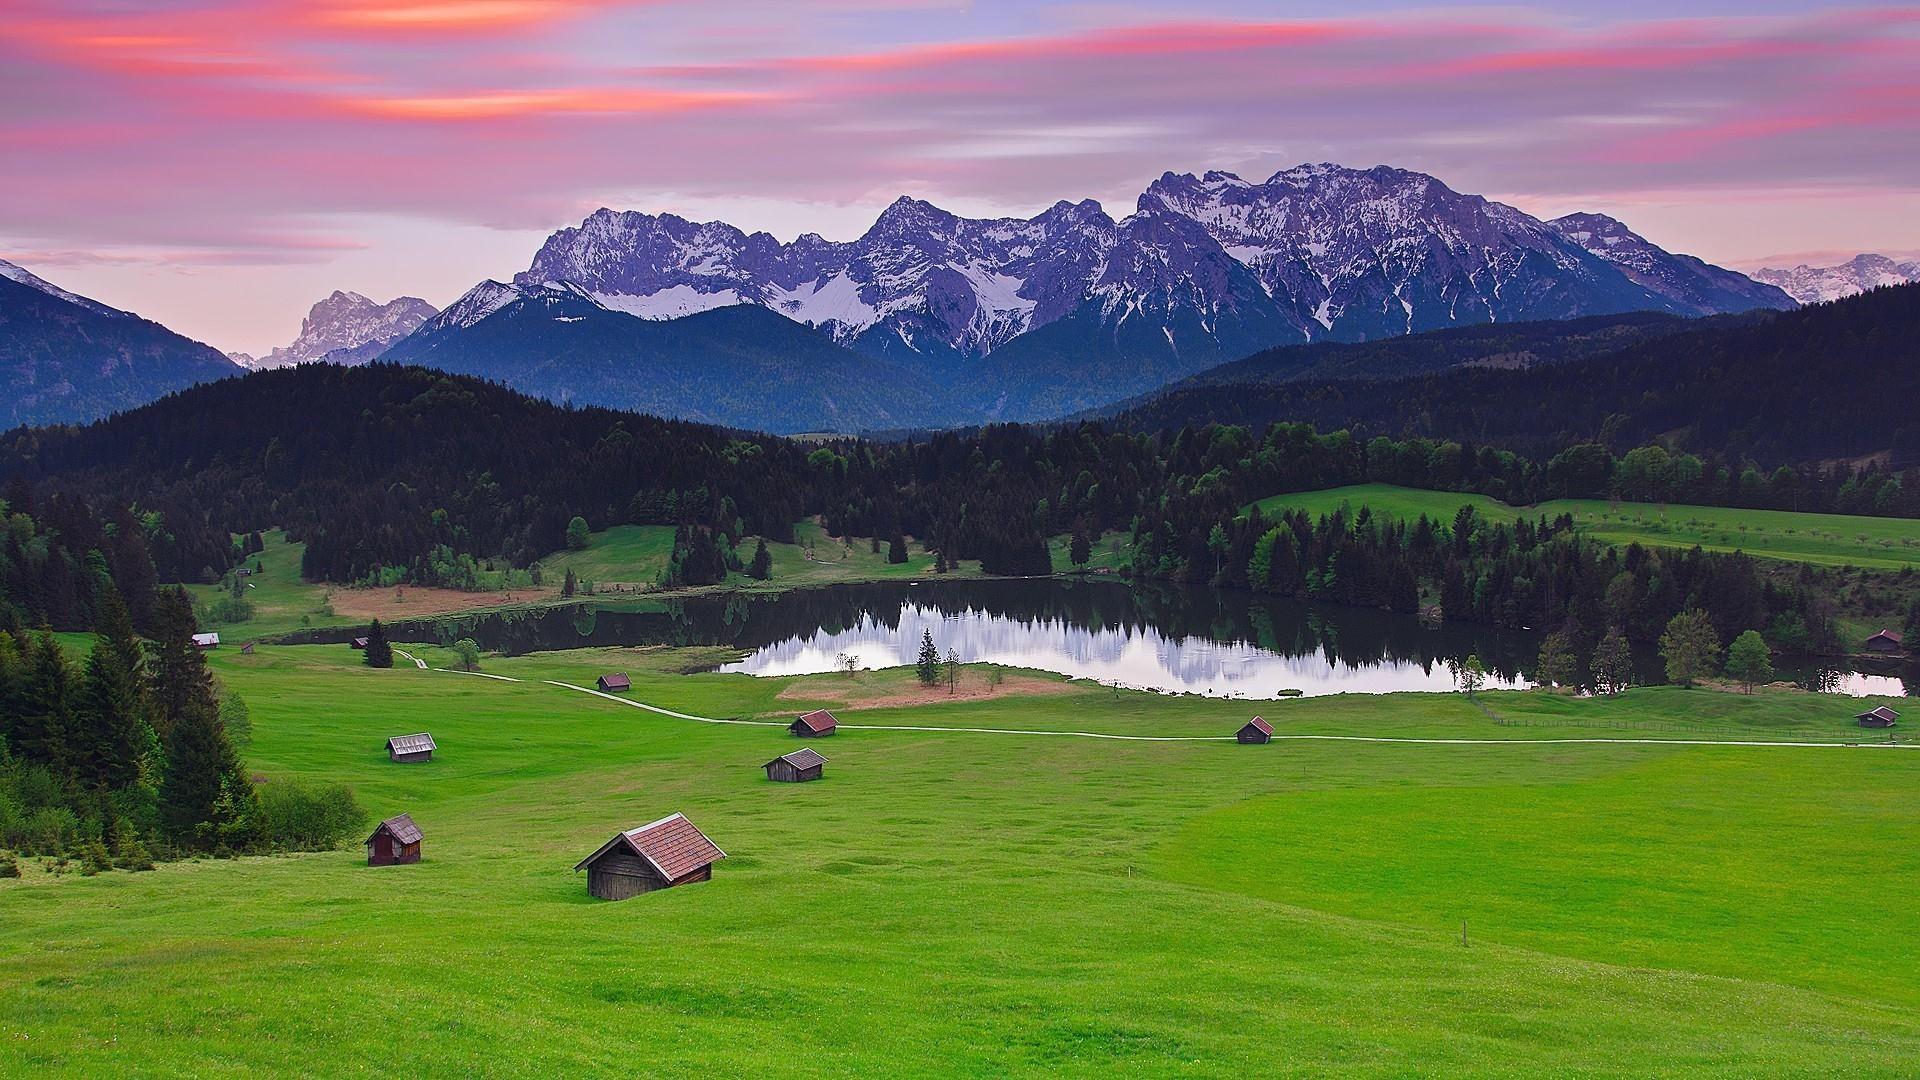 Beautiful Nature Corner Landscape Wallpaper - http://dailywallpapers.com/beautiful-nature-corner-landscape-wallpaper/ - #Wallpapers #CoverPhotos #Nature